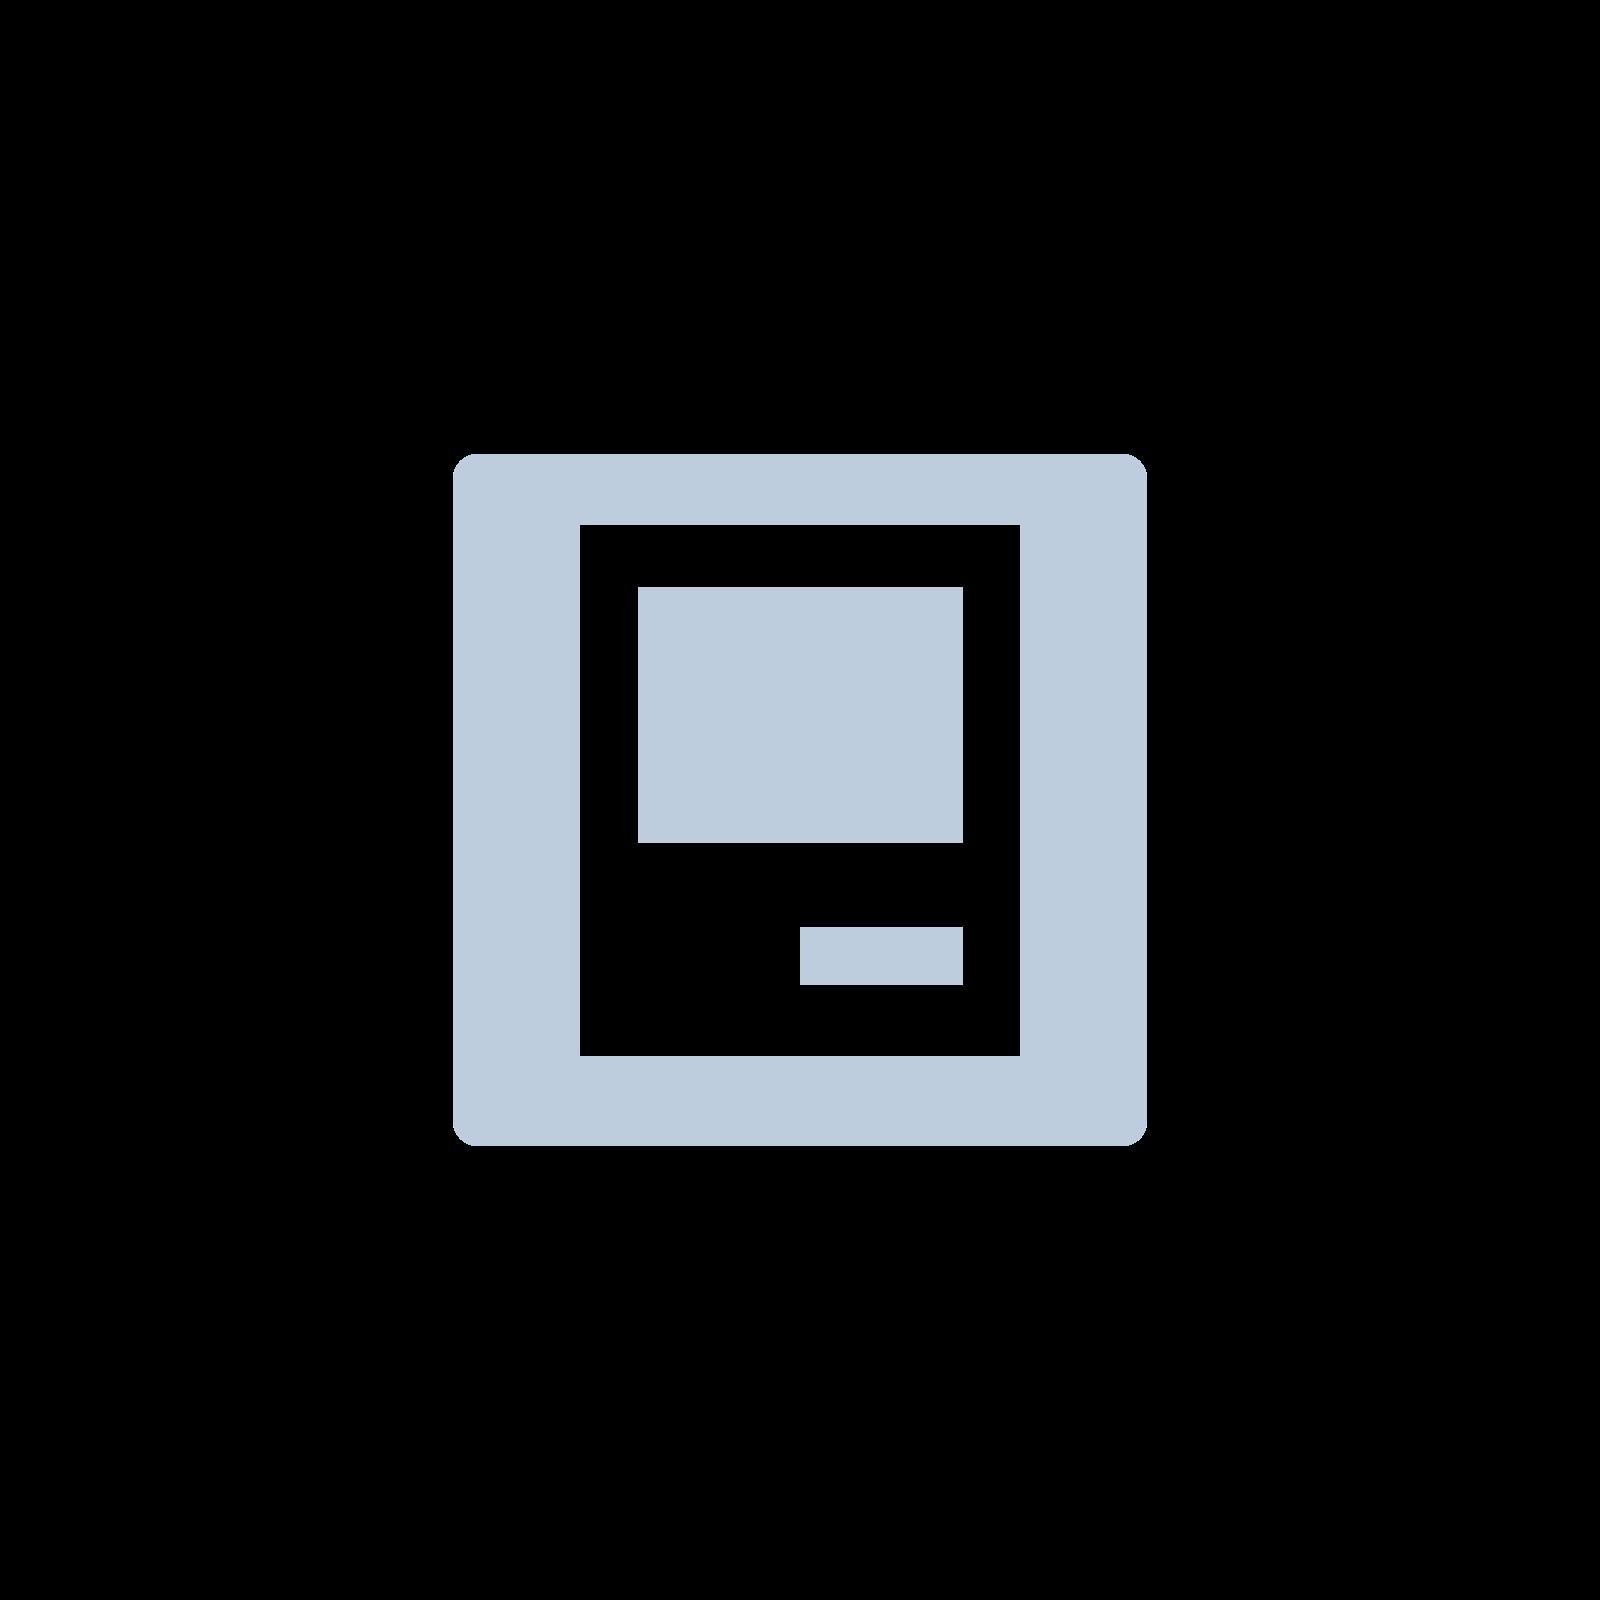 HomePod Space Grau